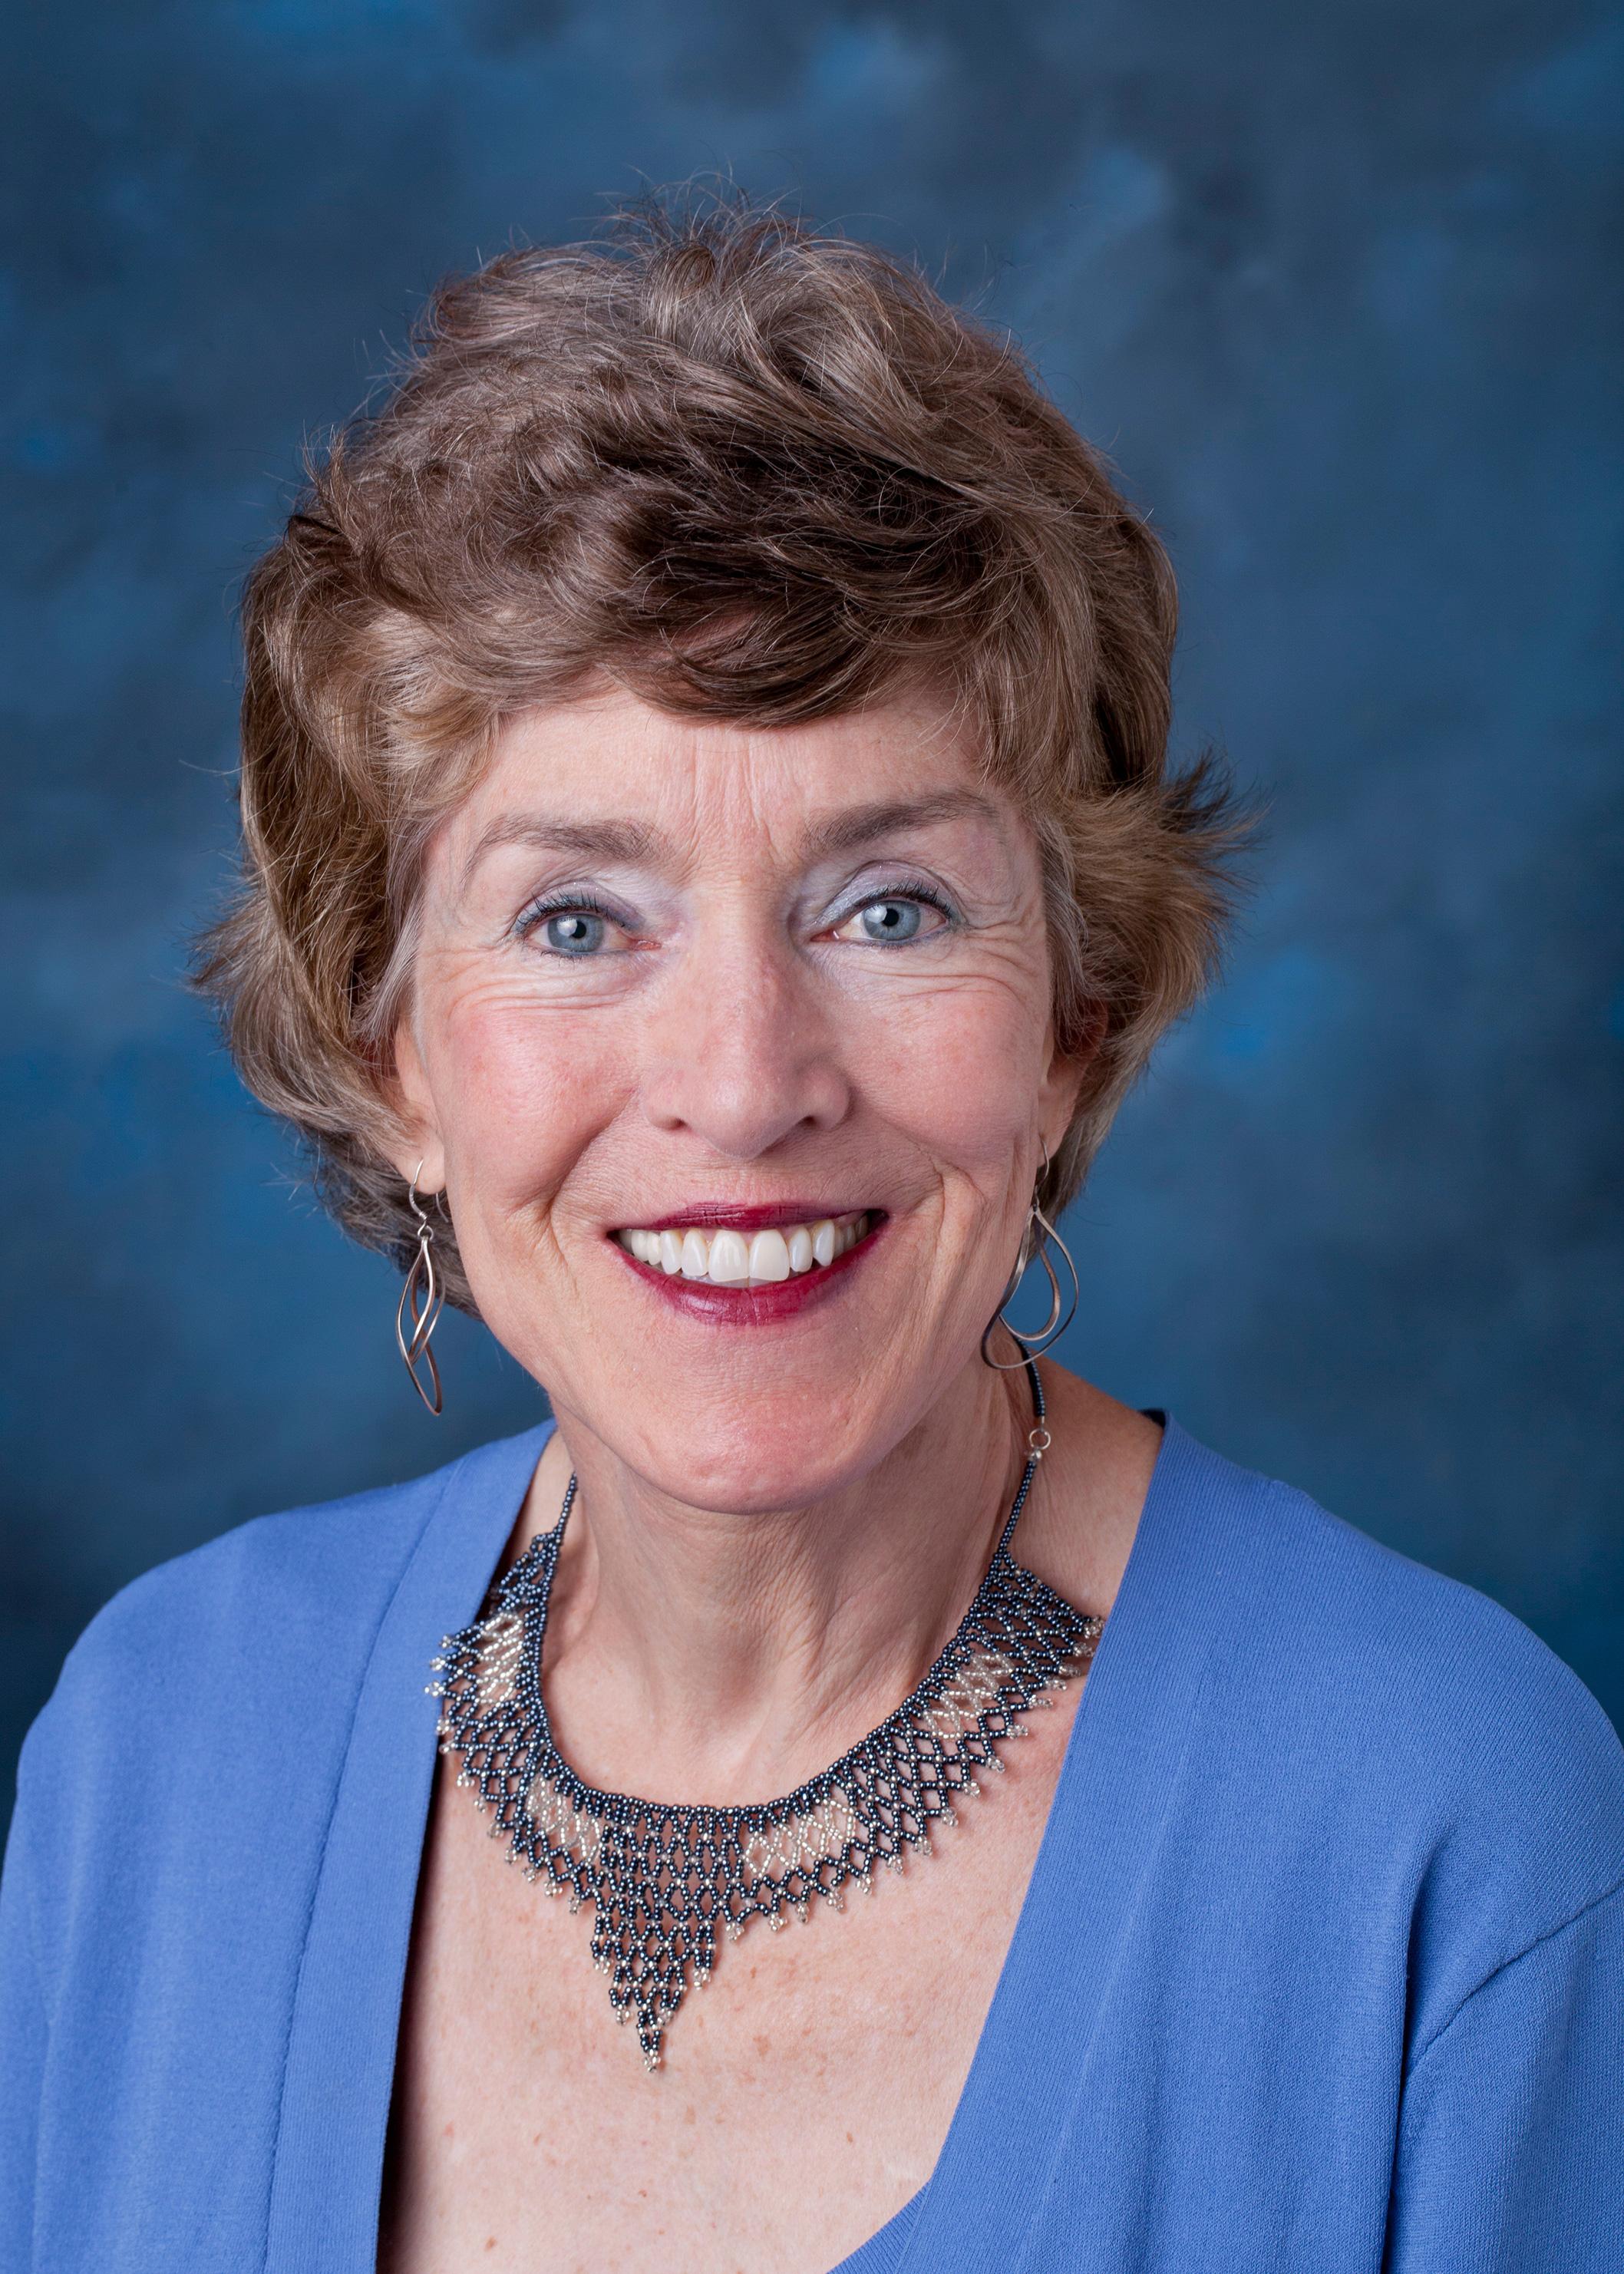 MG 6026 - President's Professor Martha McCarthy Honored with National Leadership Award